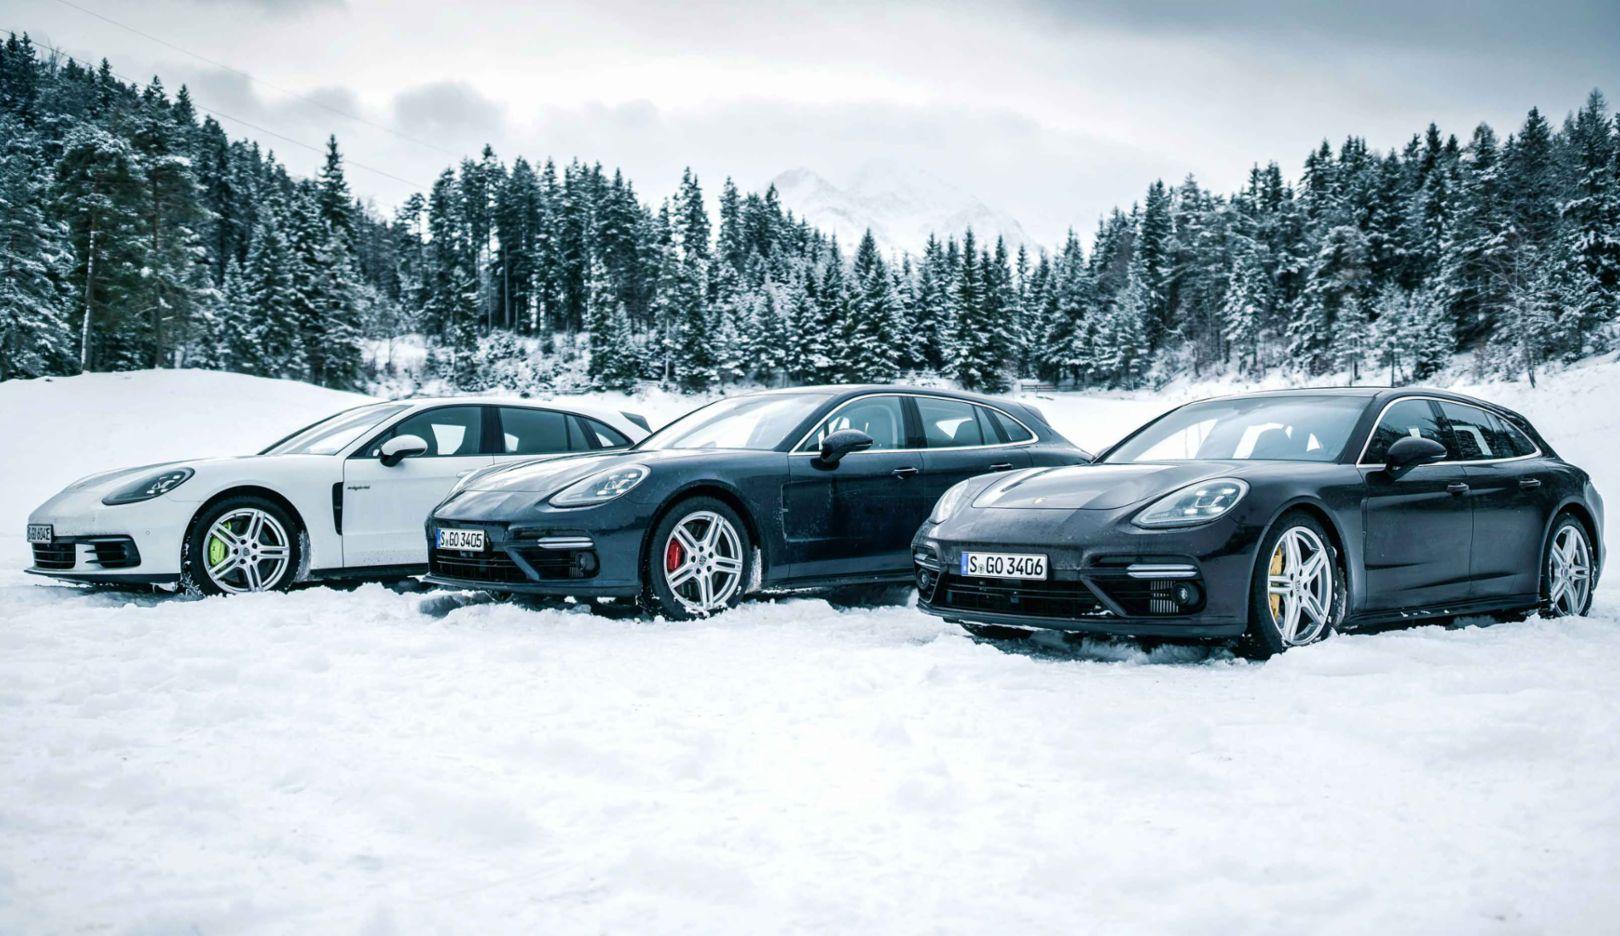 Panamera Turbo Sport Turismo, Panamera 4 E-Hybrid Sport Turismo, Roadtrip, Österreich, 2017, Porsche AG